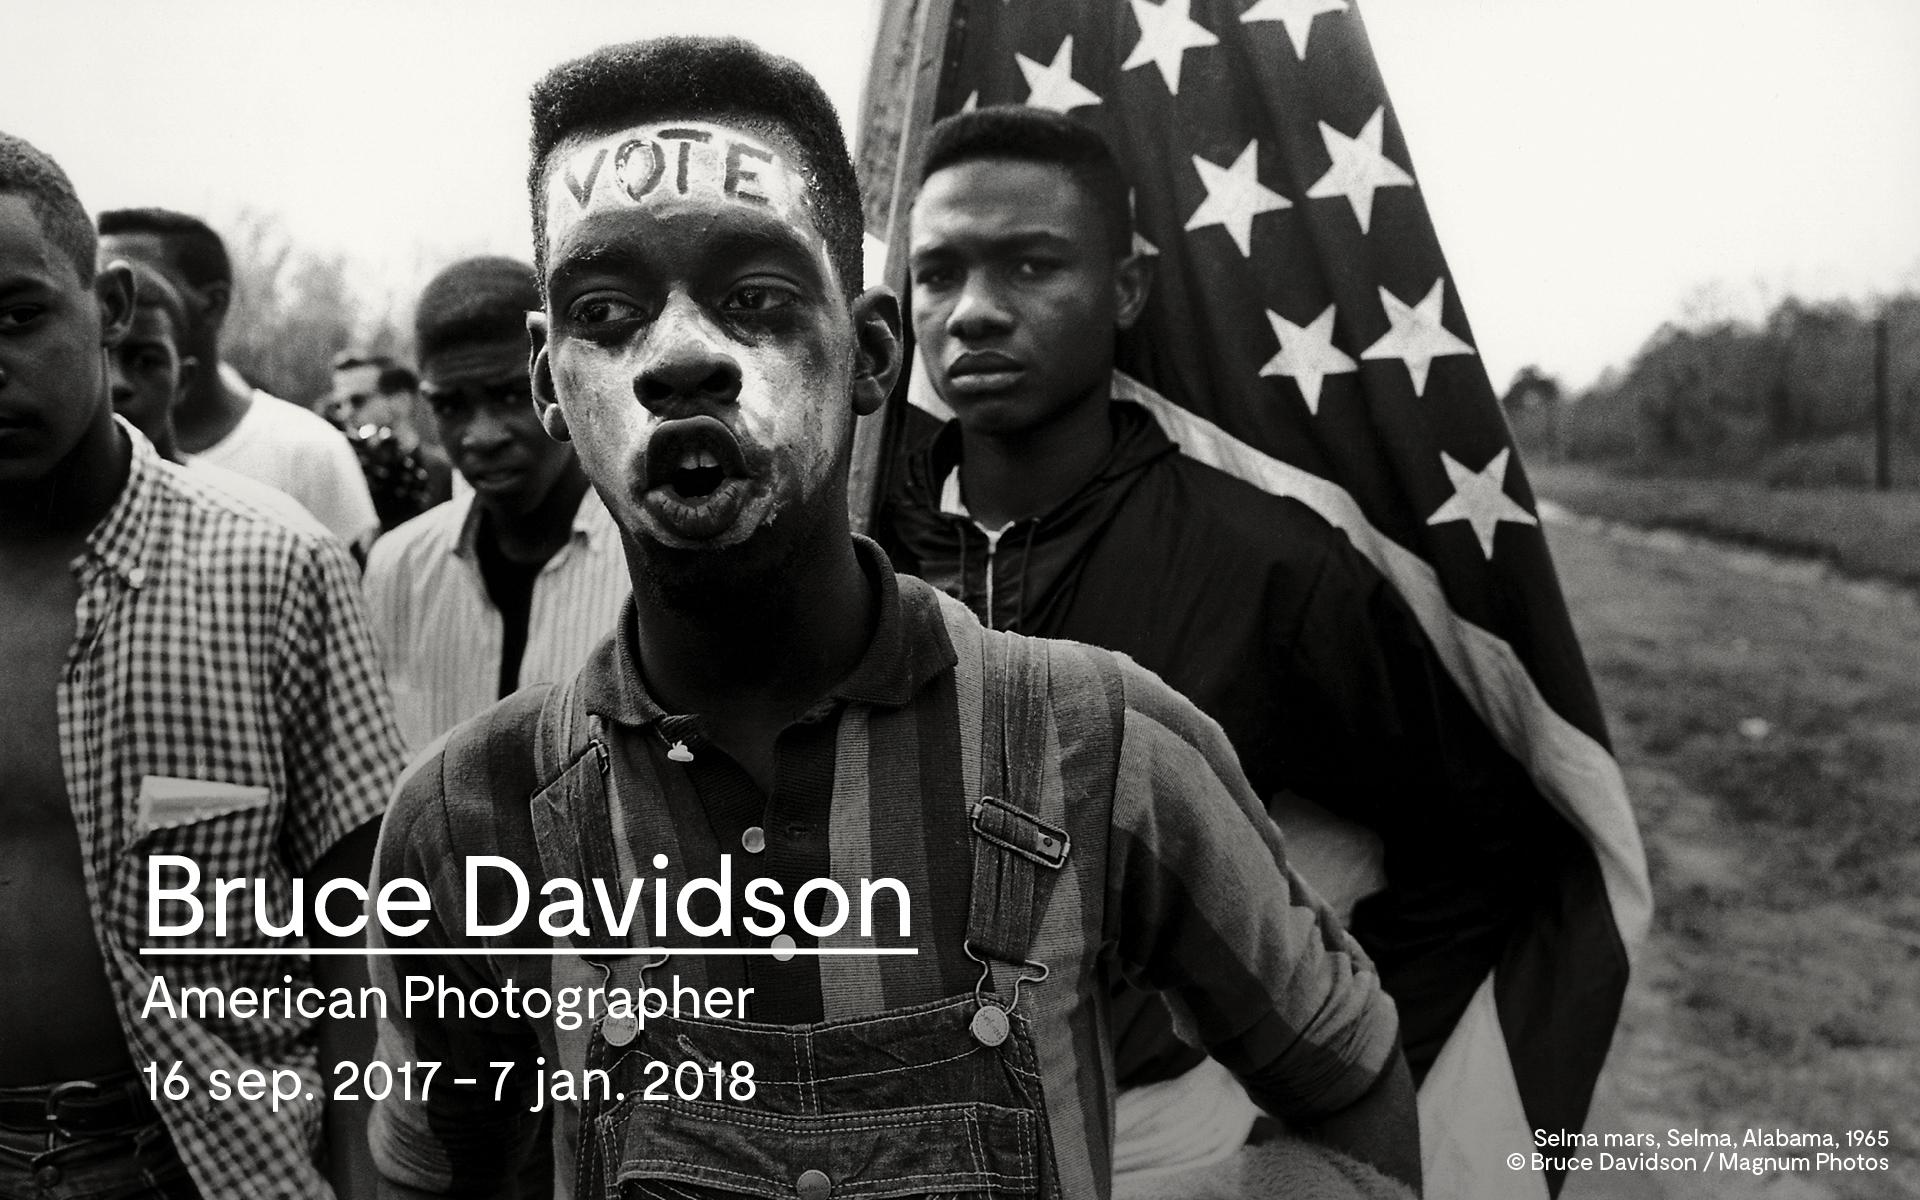 bruce-davidson-american-photographer